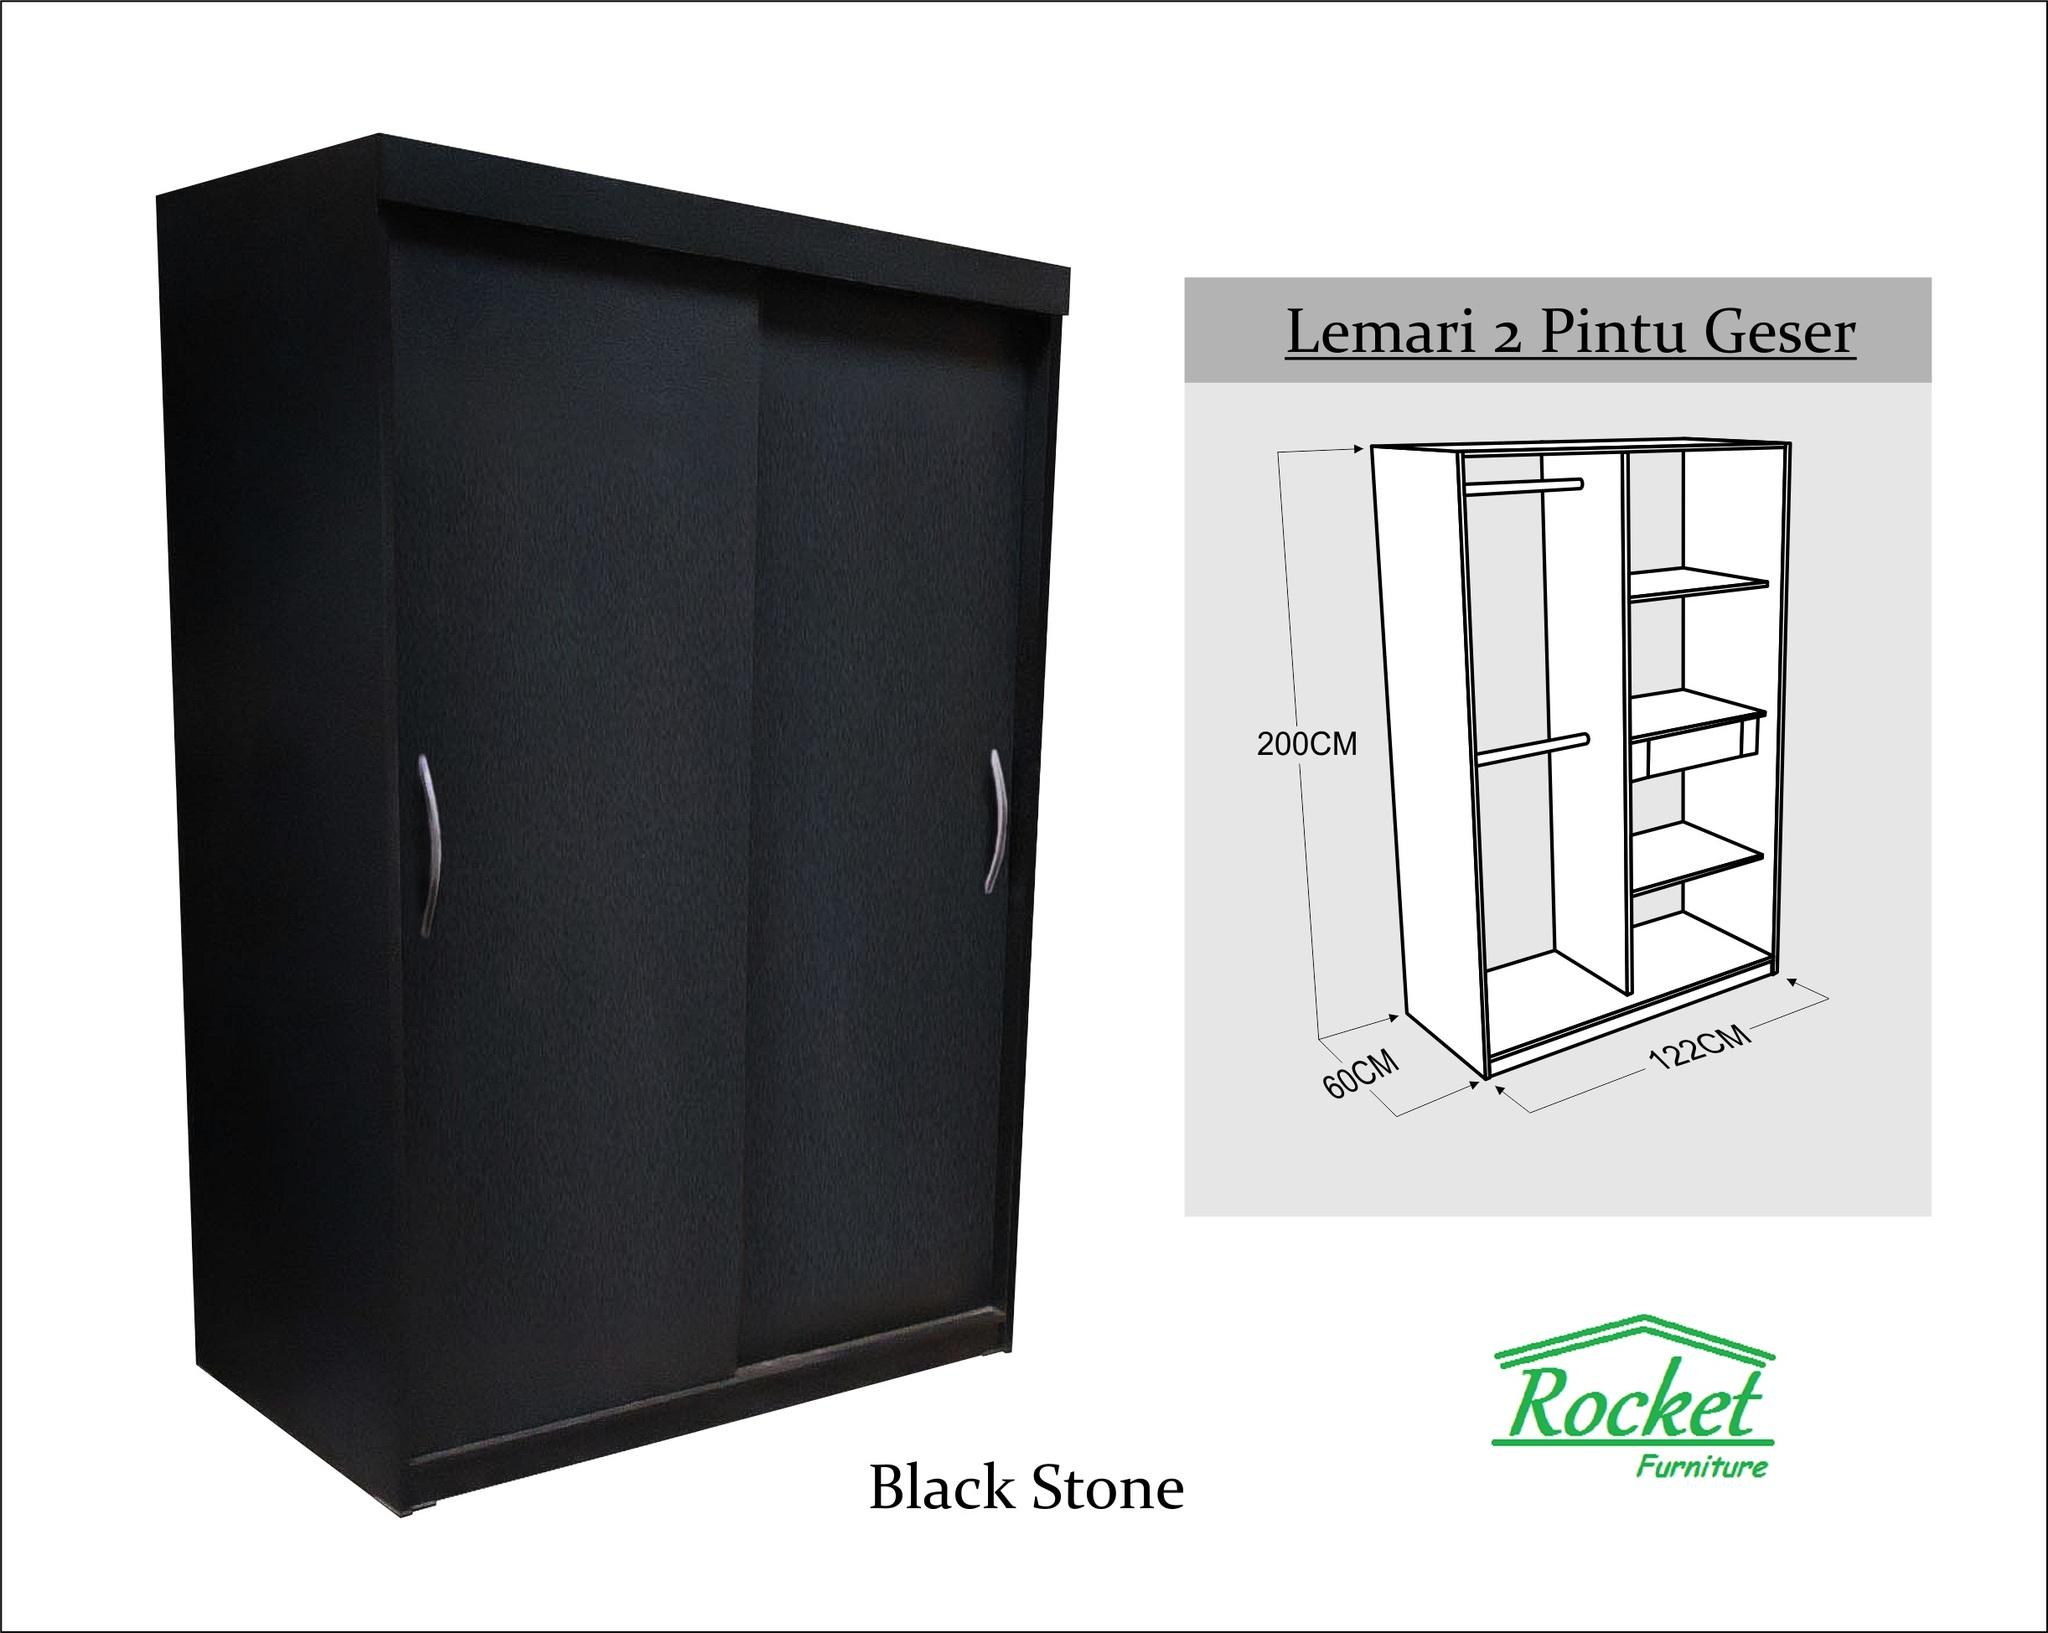 jual lemari pakaian sliding door 2 pintu hpl hitam rocket furniture tokopedia